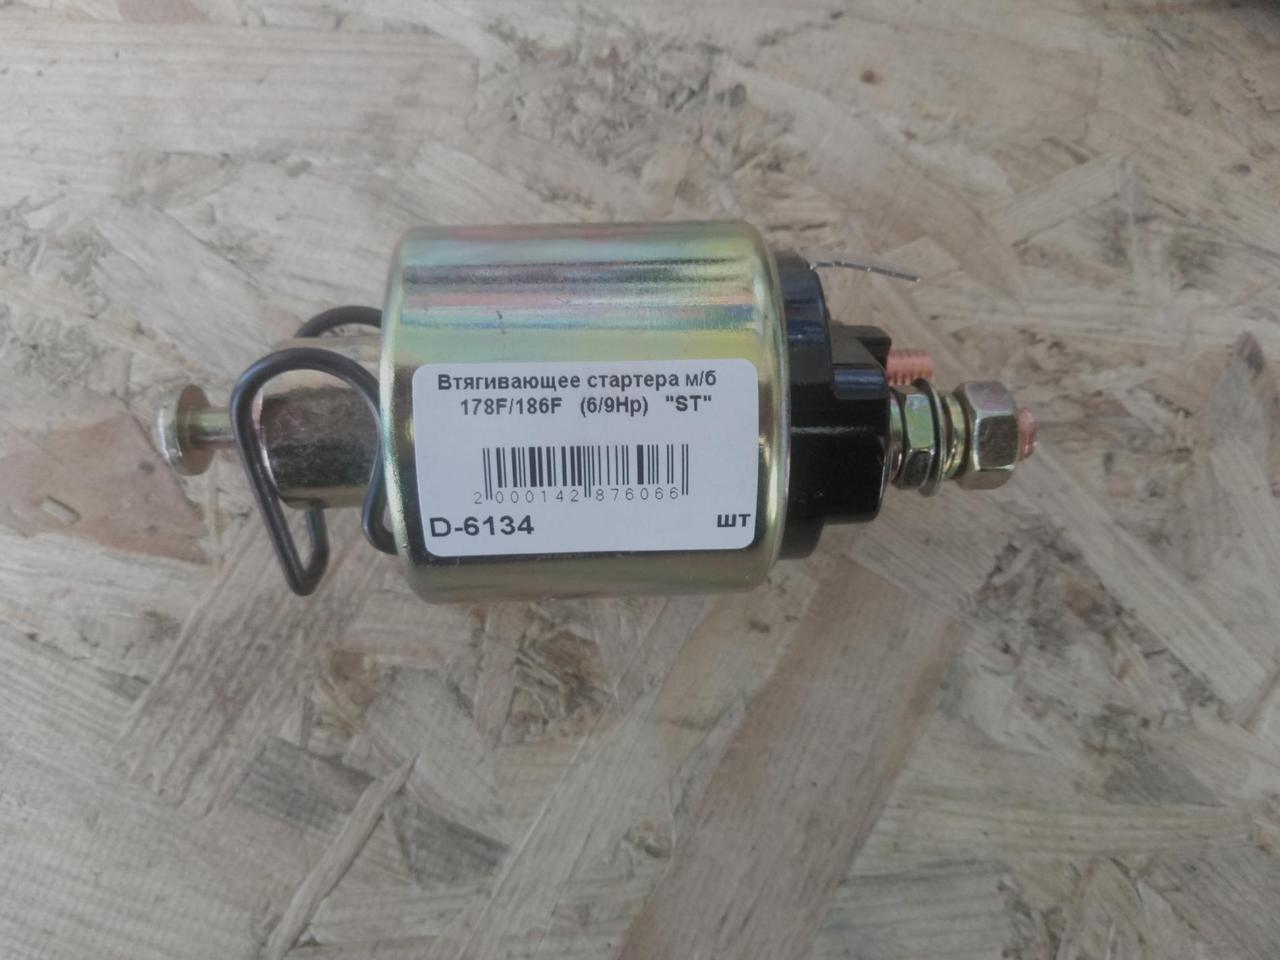 Втягивающее стартера на Мотоблок 178F/186F (6/9 Hp Лошадиных Сил) ST